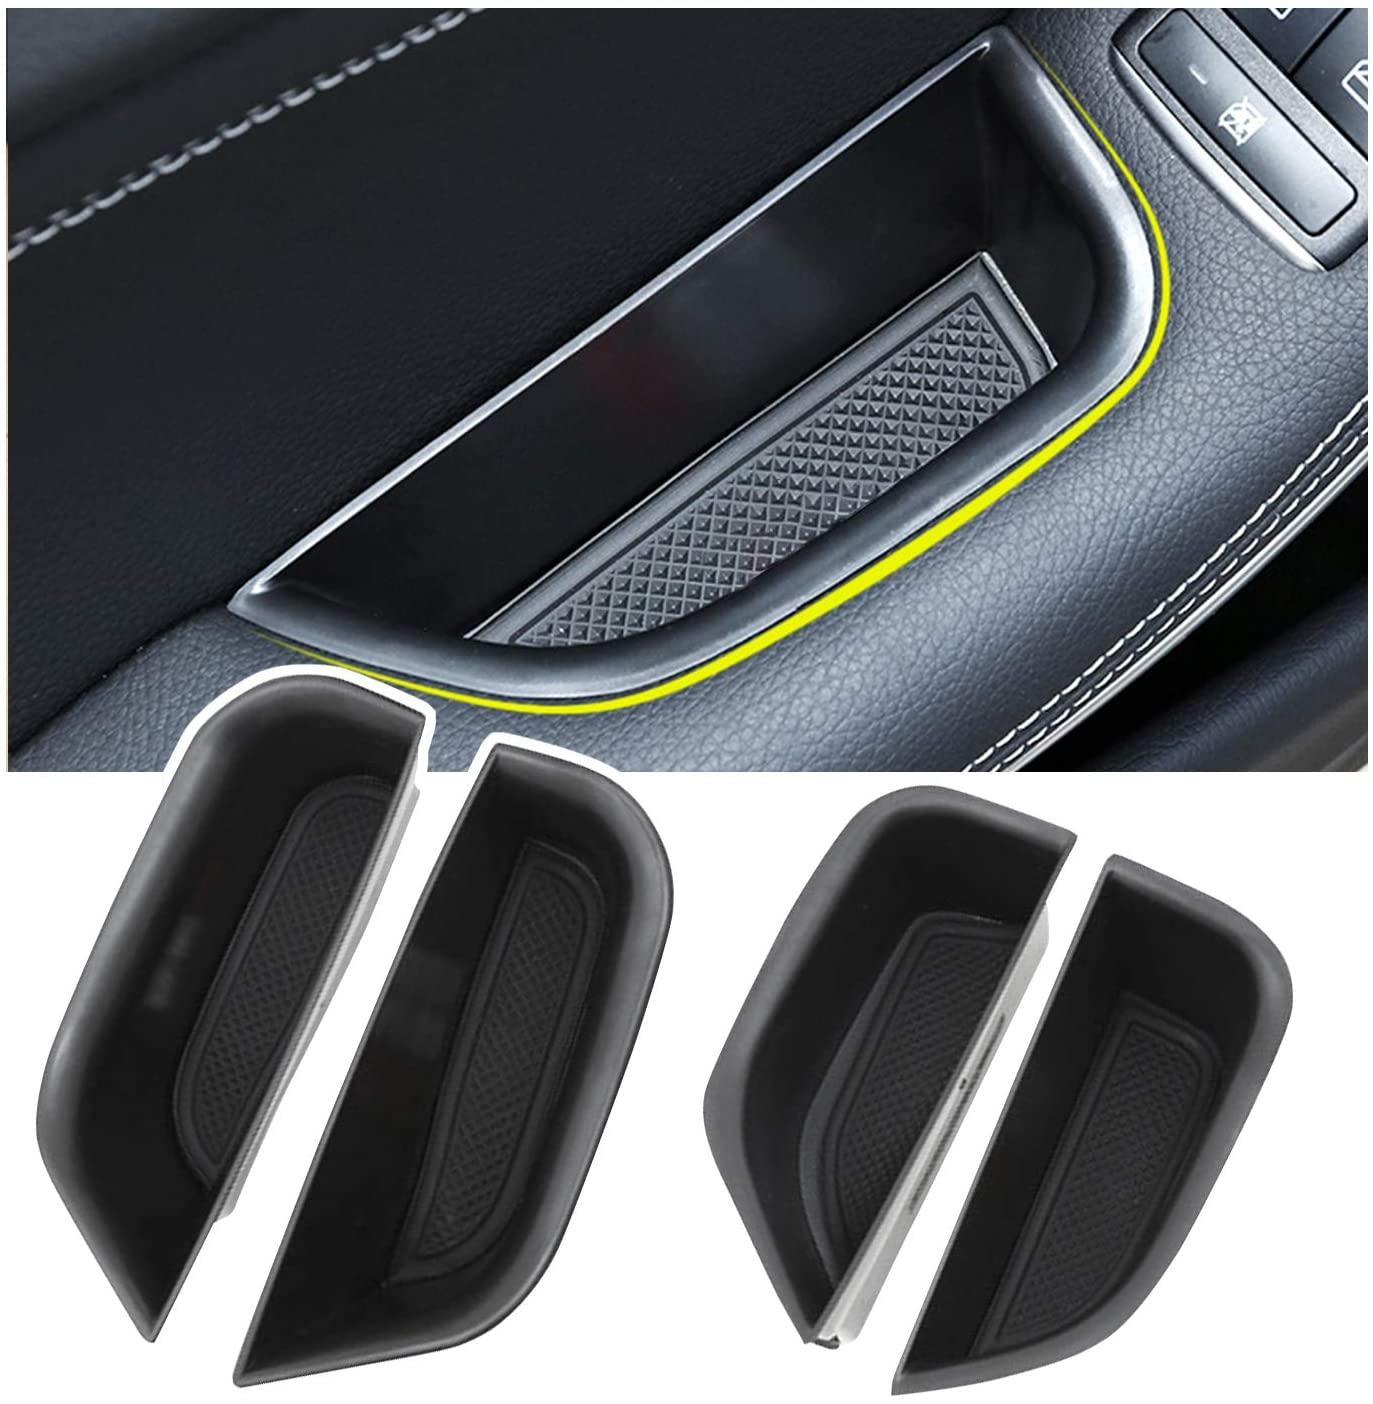 YEE PIN Grab Handle Tray Passenger Organizer Tray Automotive Grab Handles Storage Box for 2014-2019 Mercedes-Benz GLA-Class X156 CLA-Class W117 4-Door, Interior Accessories